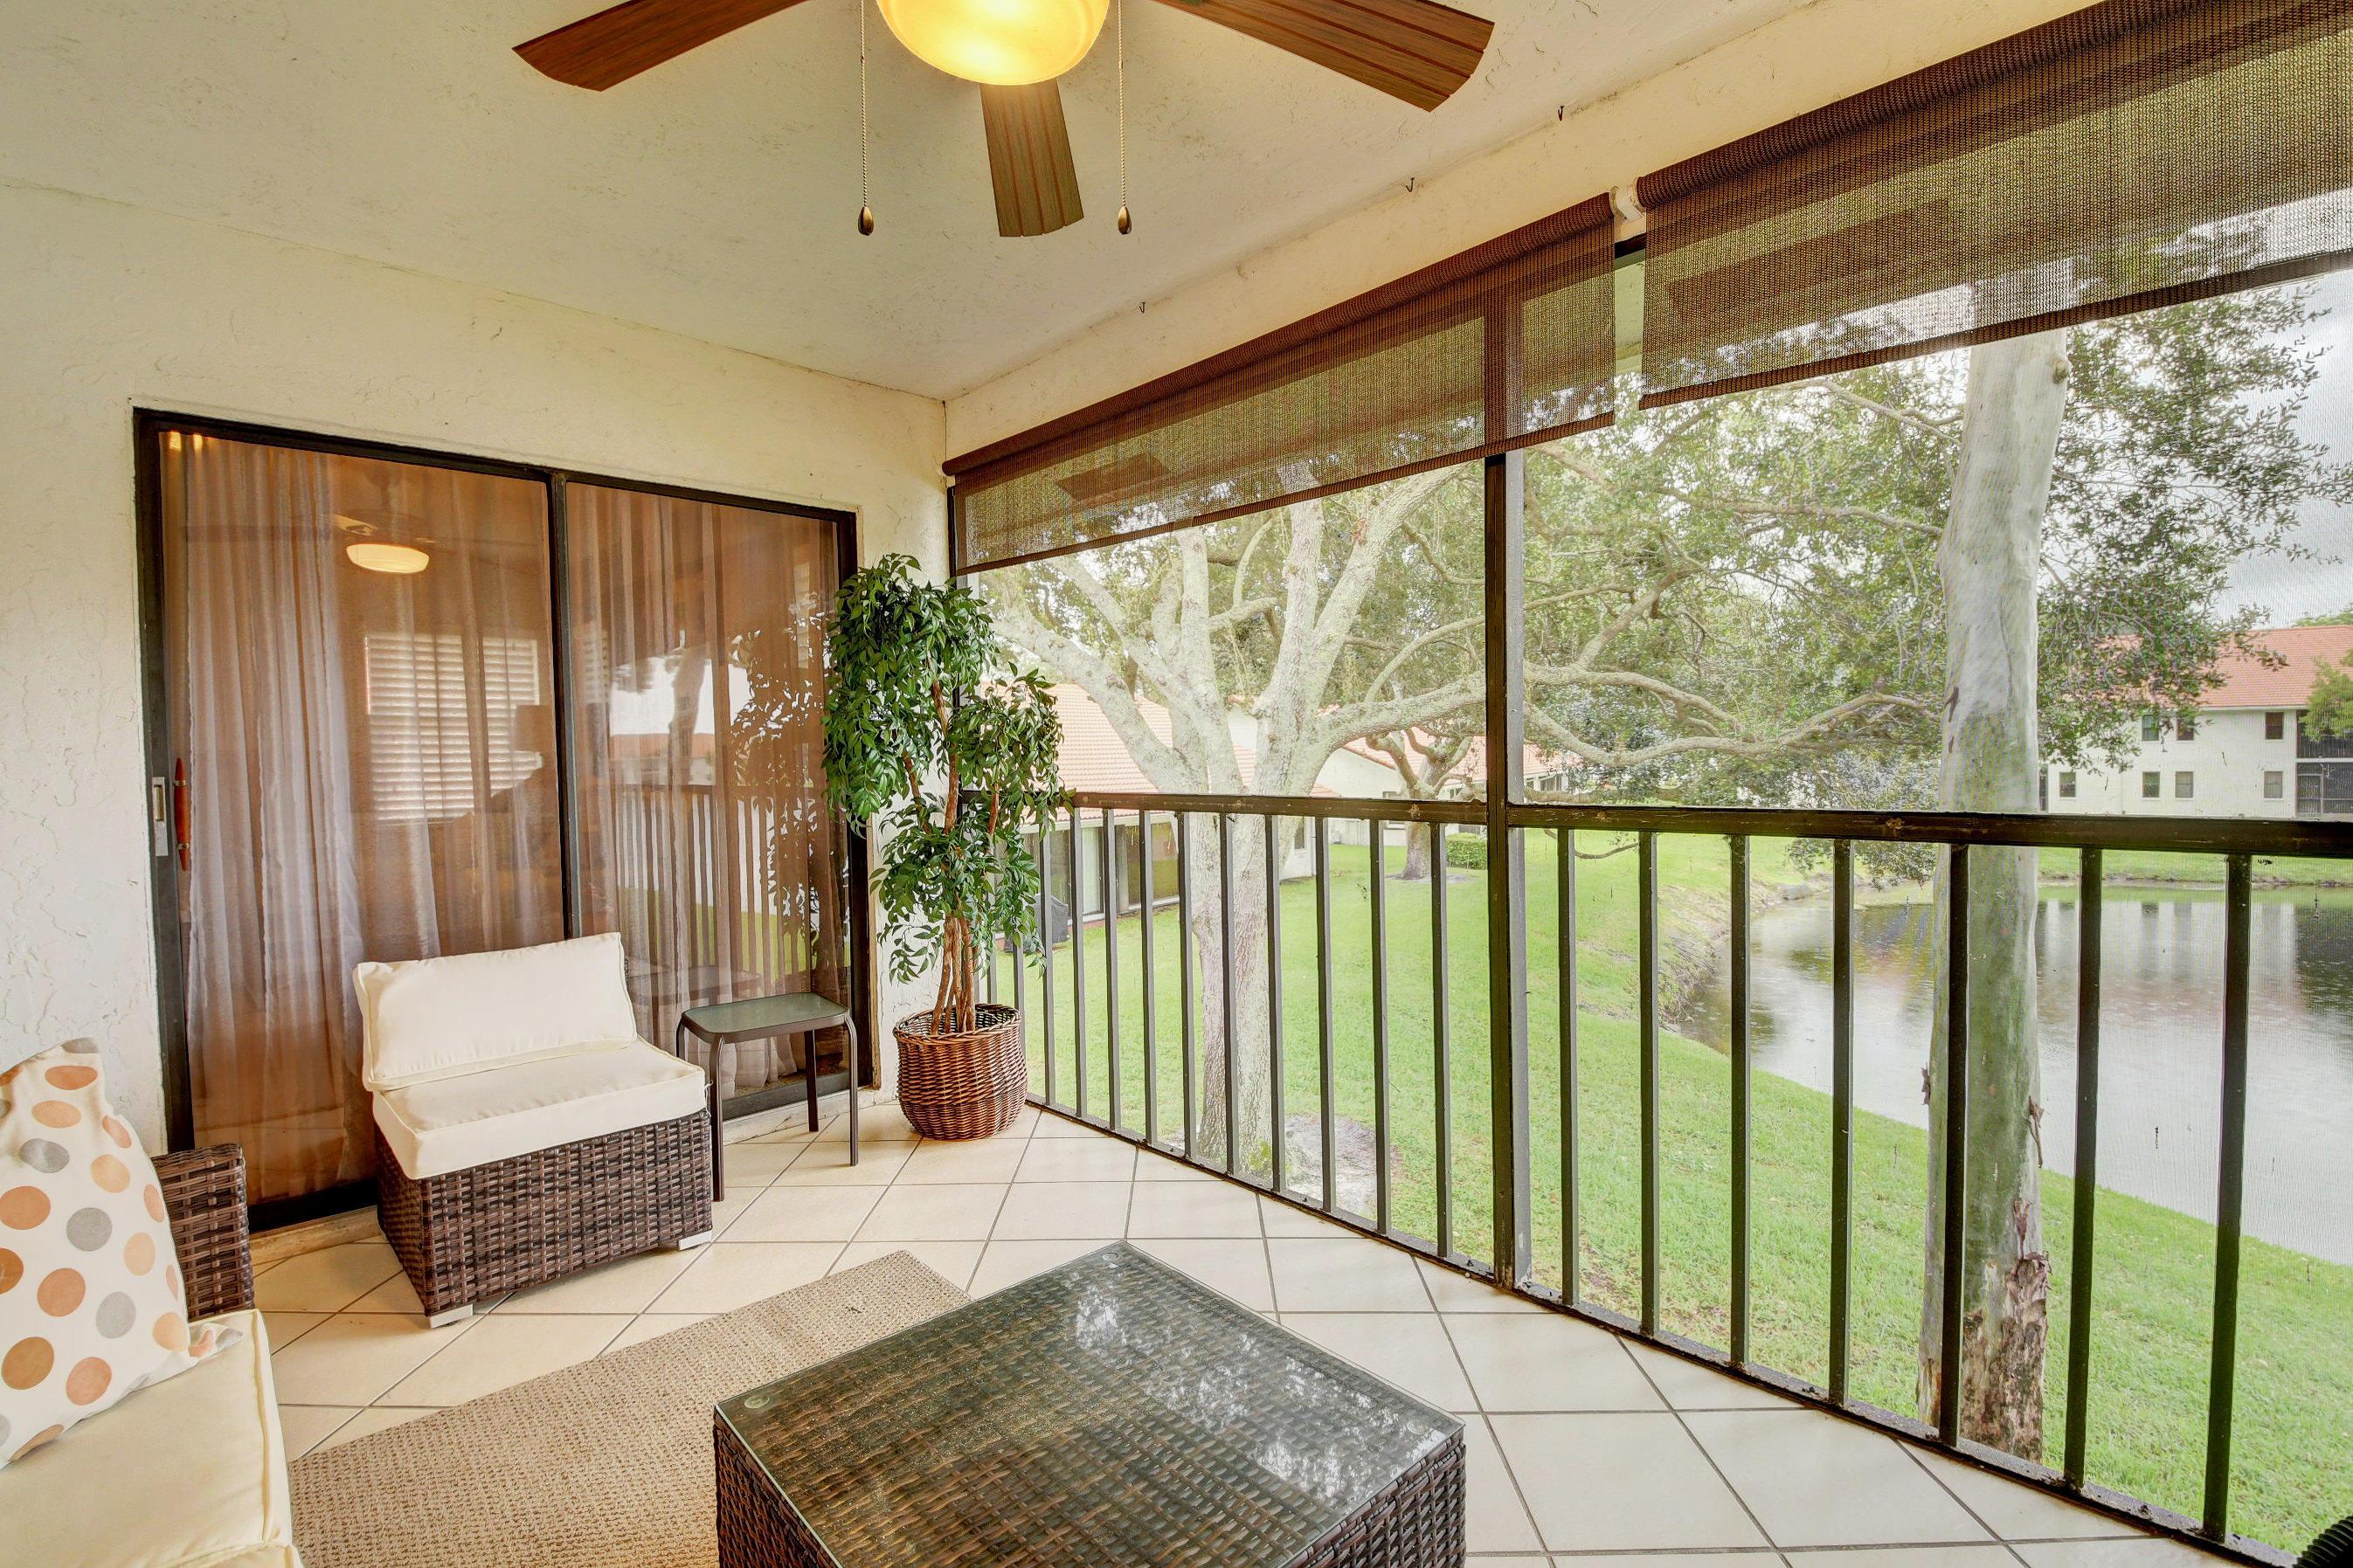 9628 Pavarotti Terrace 201 Boynton Beach, FL 33437 photo 34